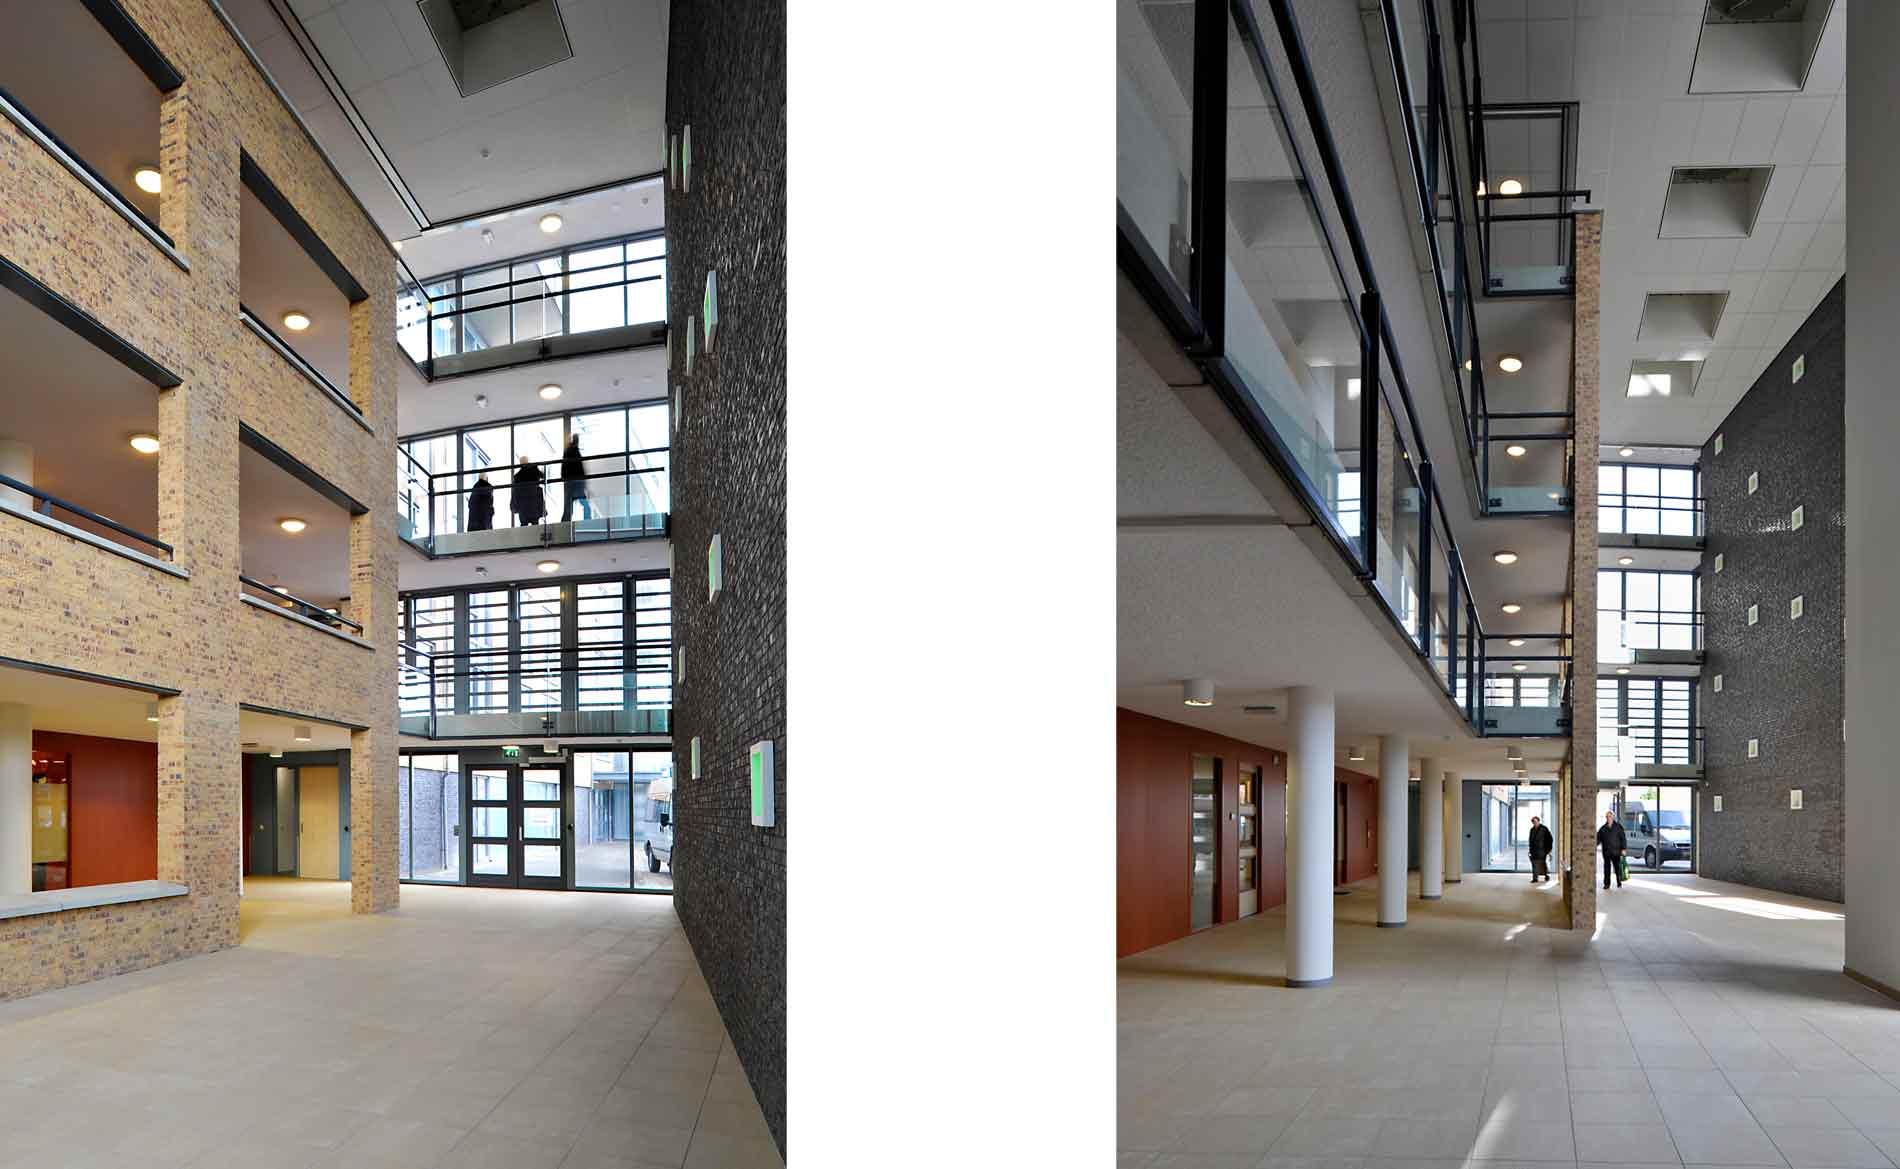 Buitenveld Den Helder BBHD architecten woonzorggebouw architectuur zorg